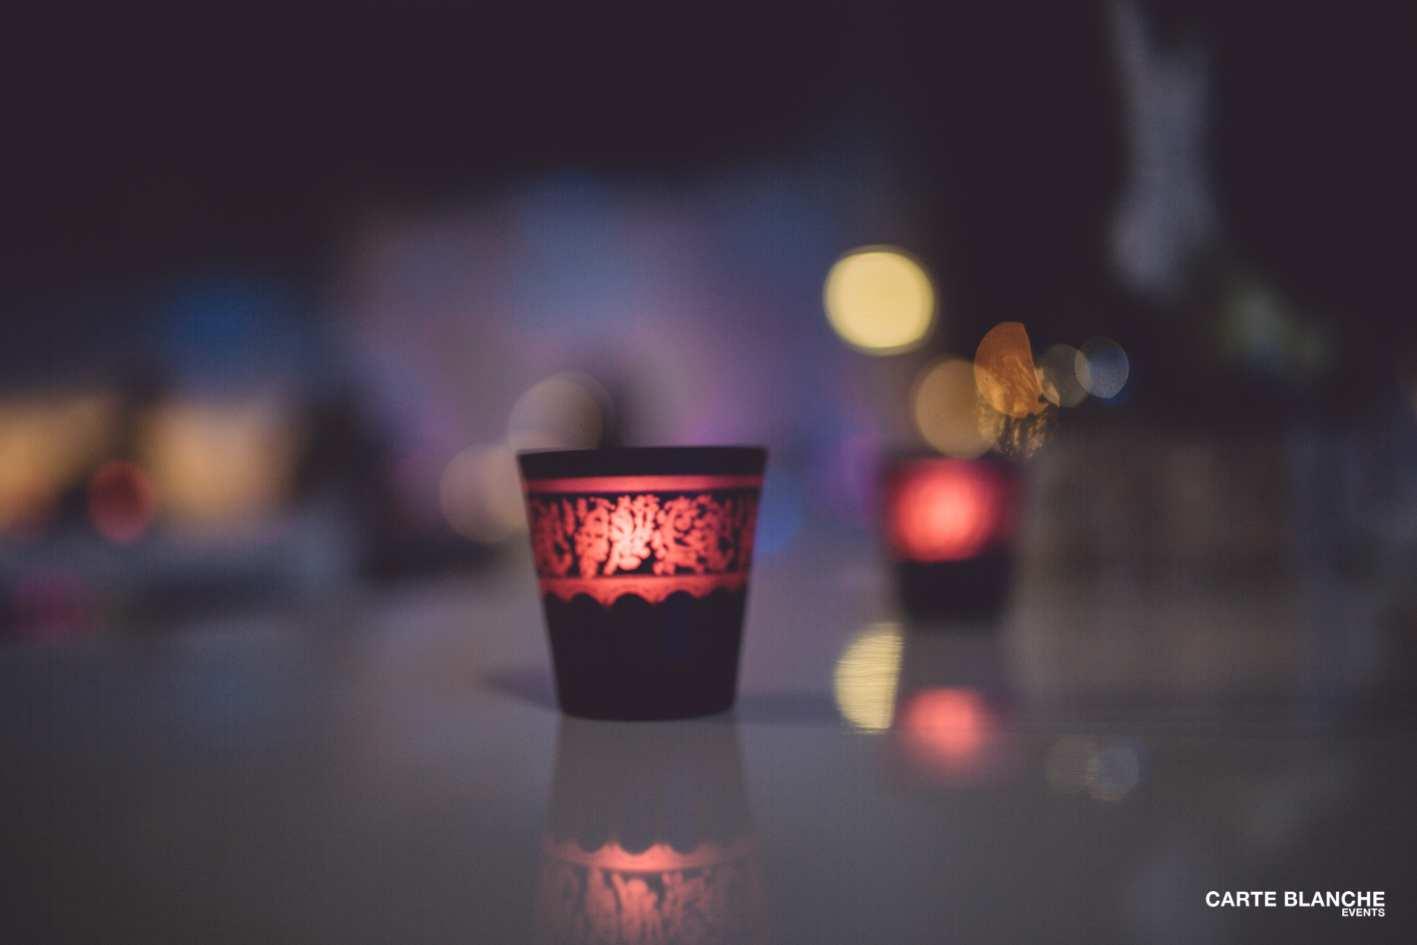 xmas-party-ferrero-2013-lumière-carte-blanche-events